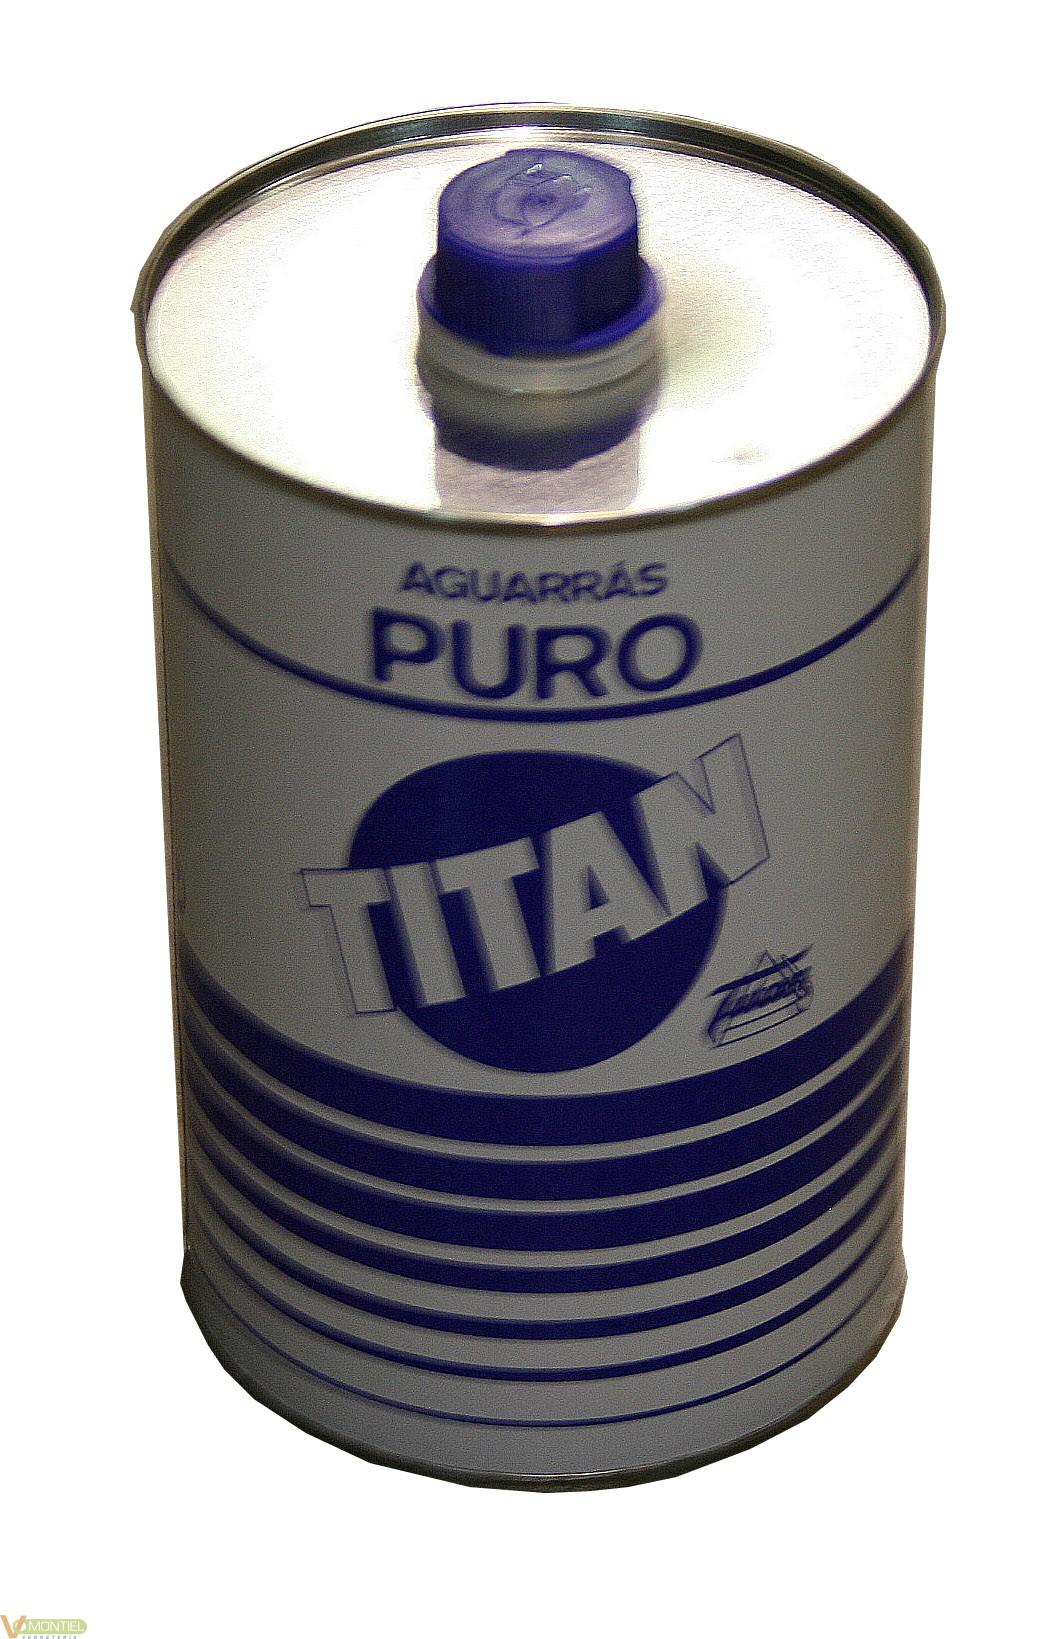 Aguarras puro 5 lt titan-0